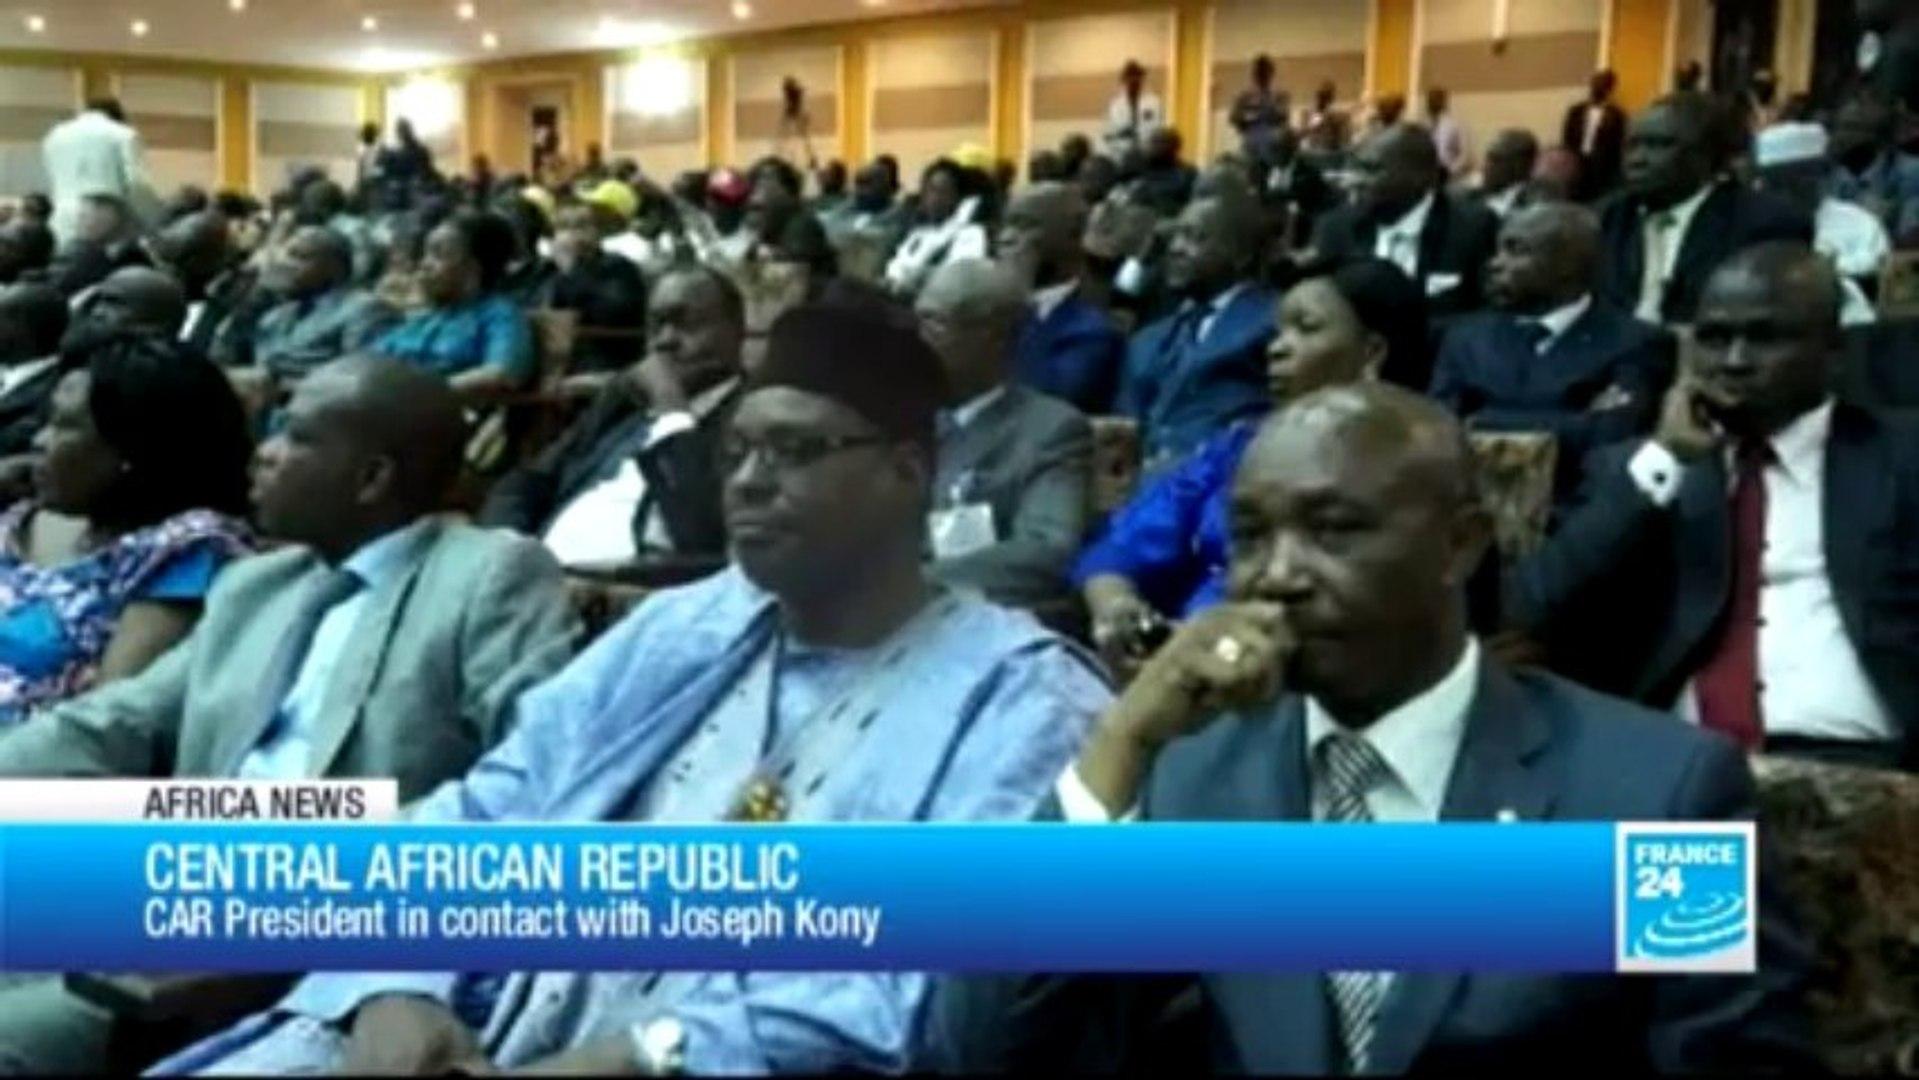 AFRICA NEWS - Mali prepares for parliamentary polls